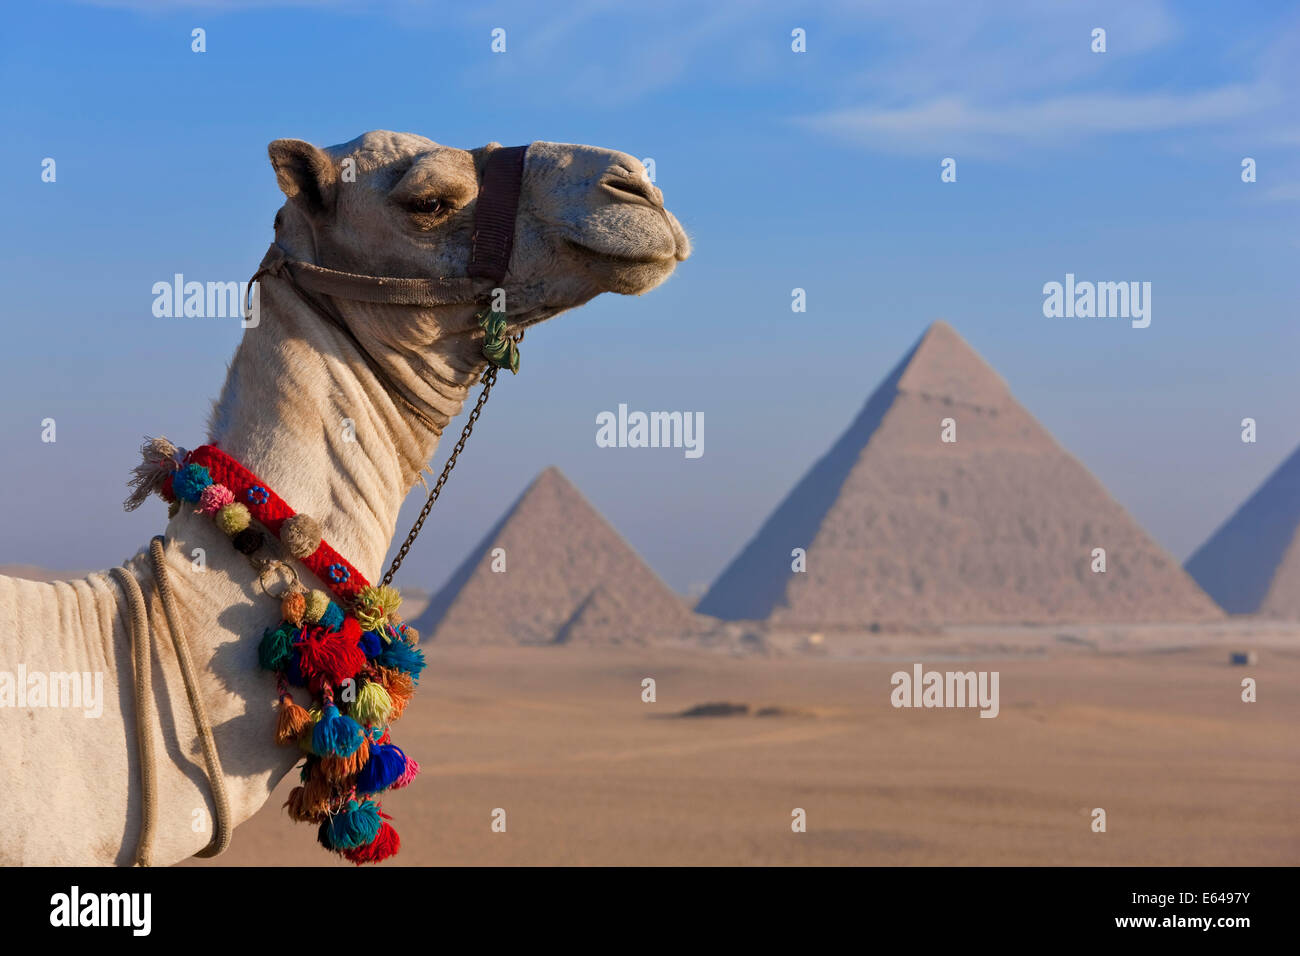 Cammelli e piramidi di Giza in Egitto Immagini Stock